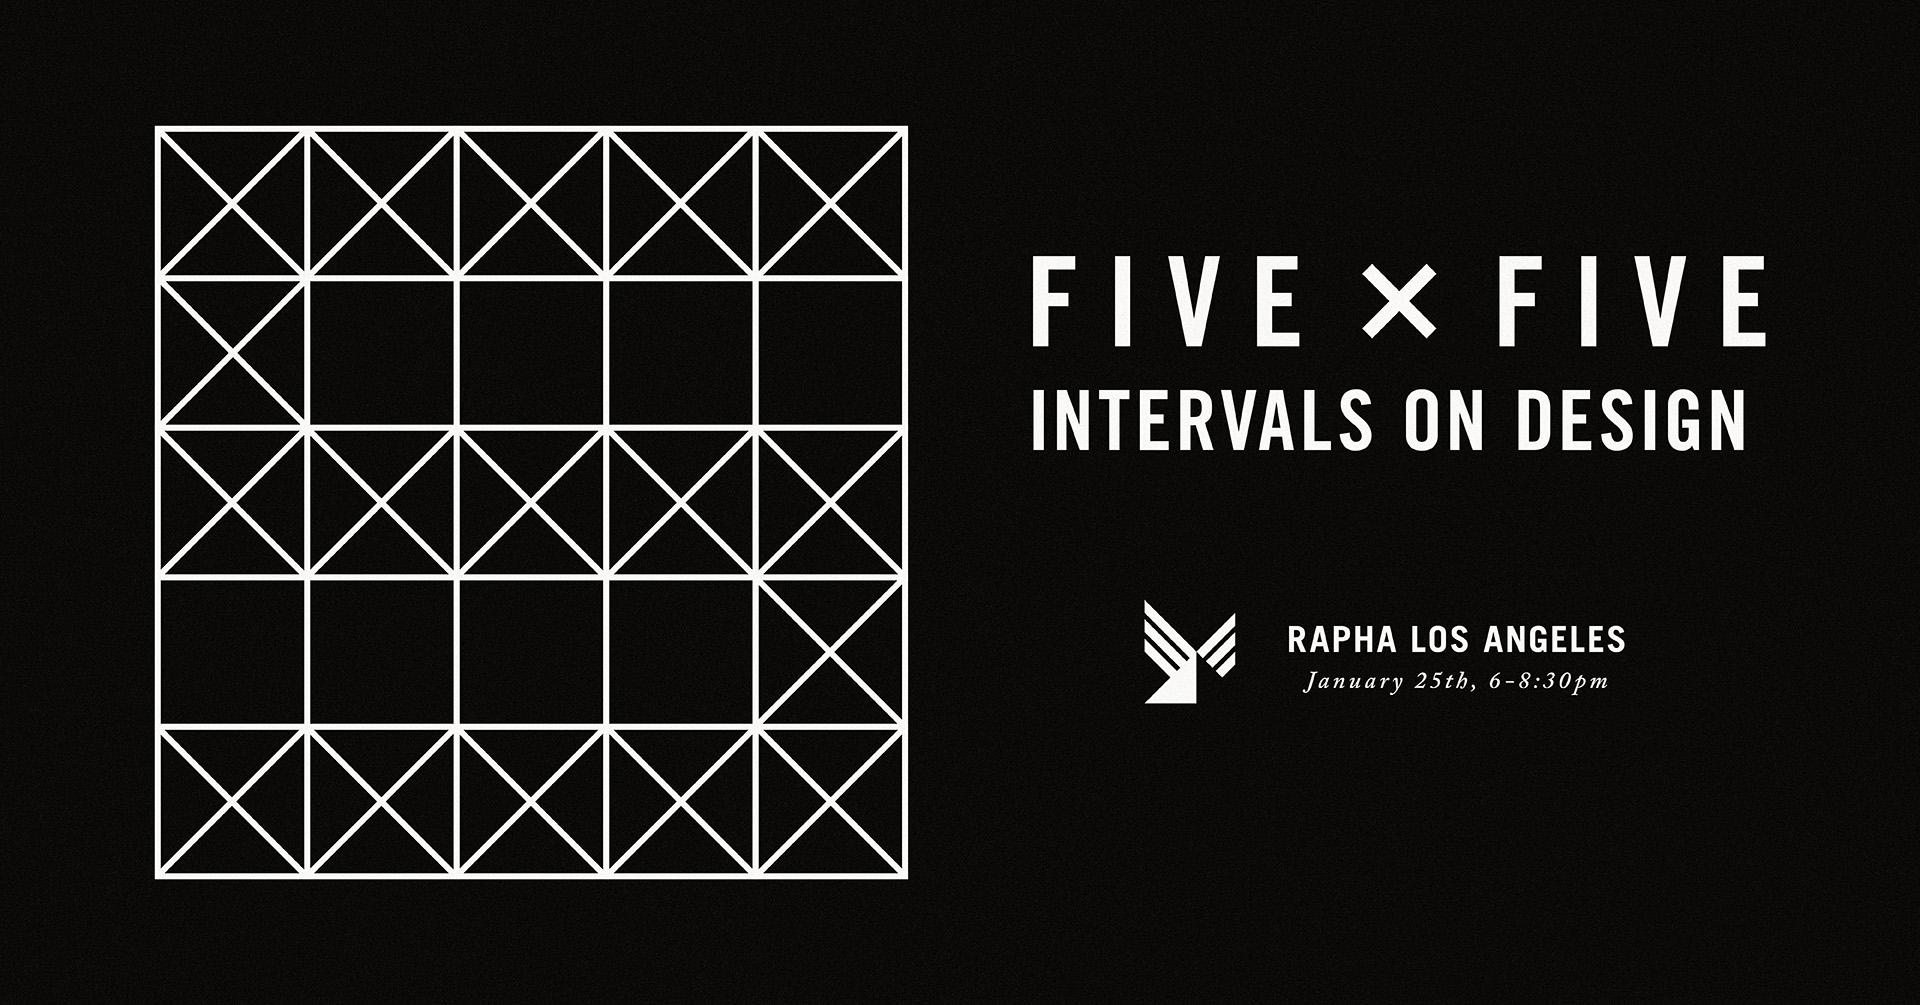 FiveXFive_Facebook.jpg